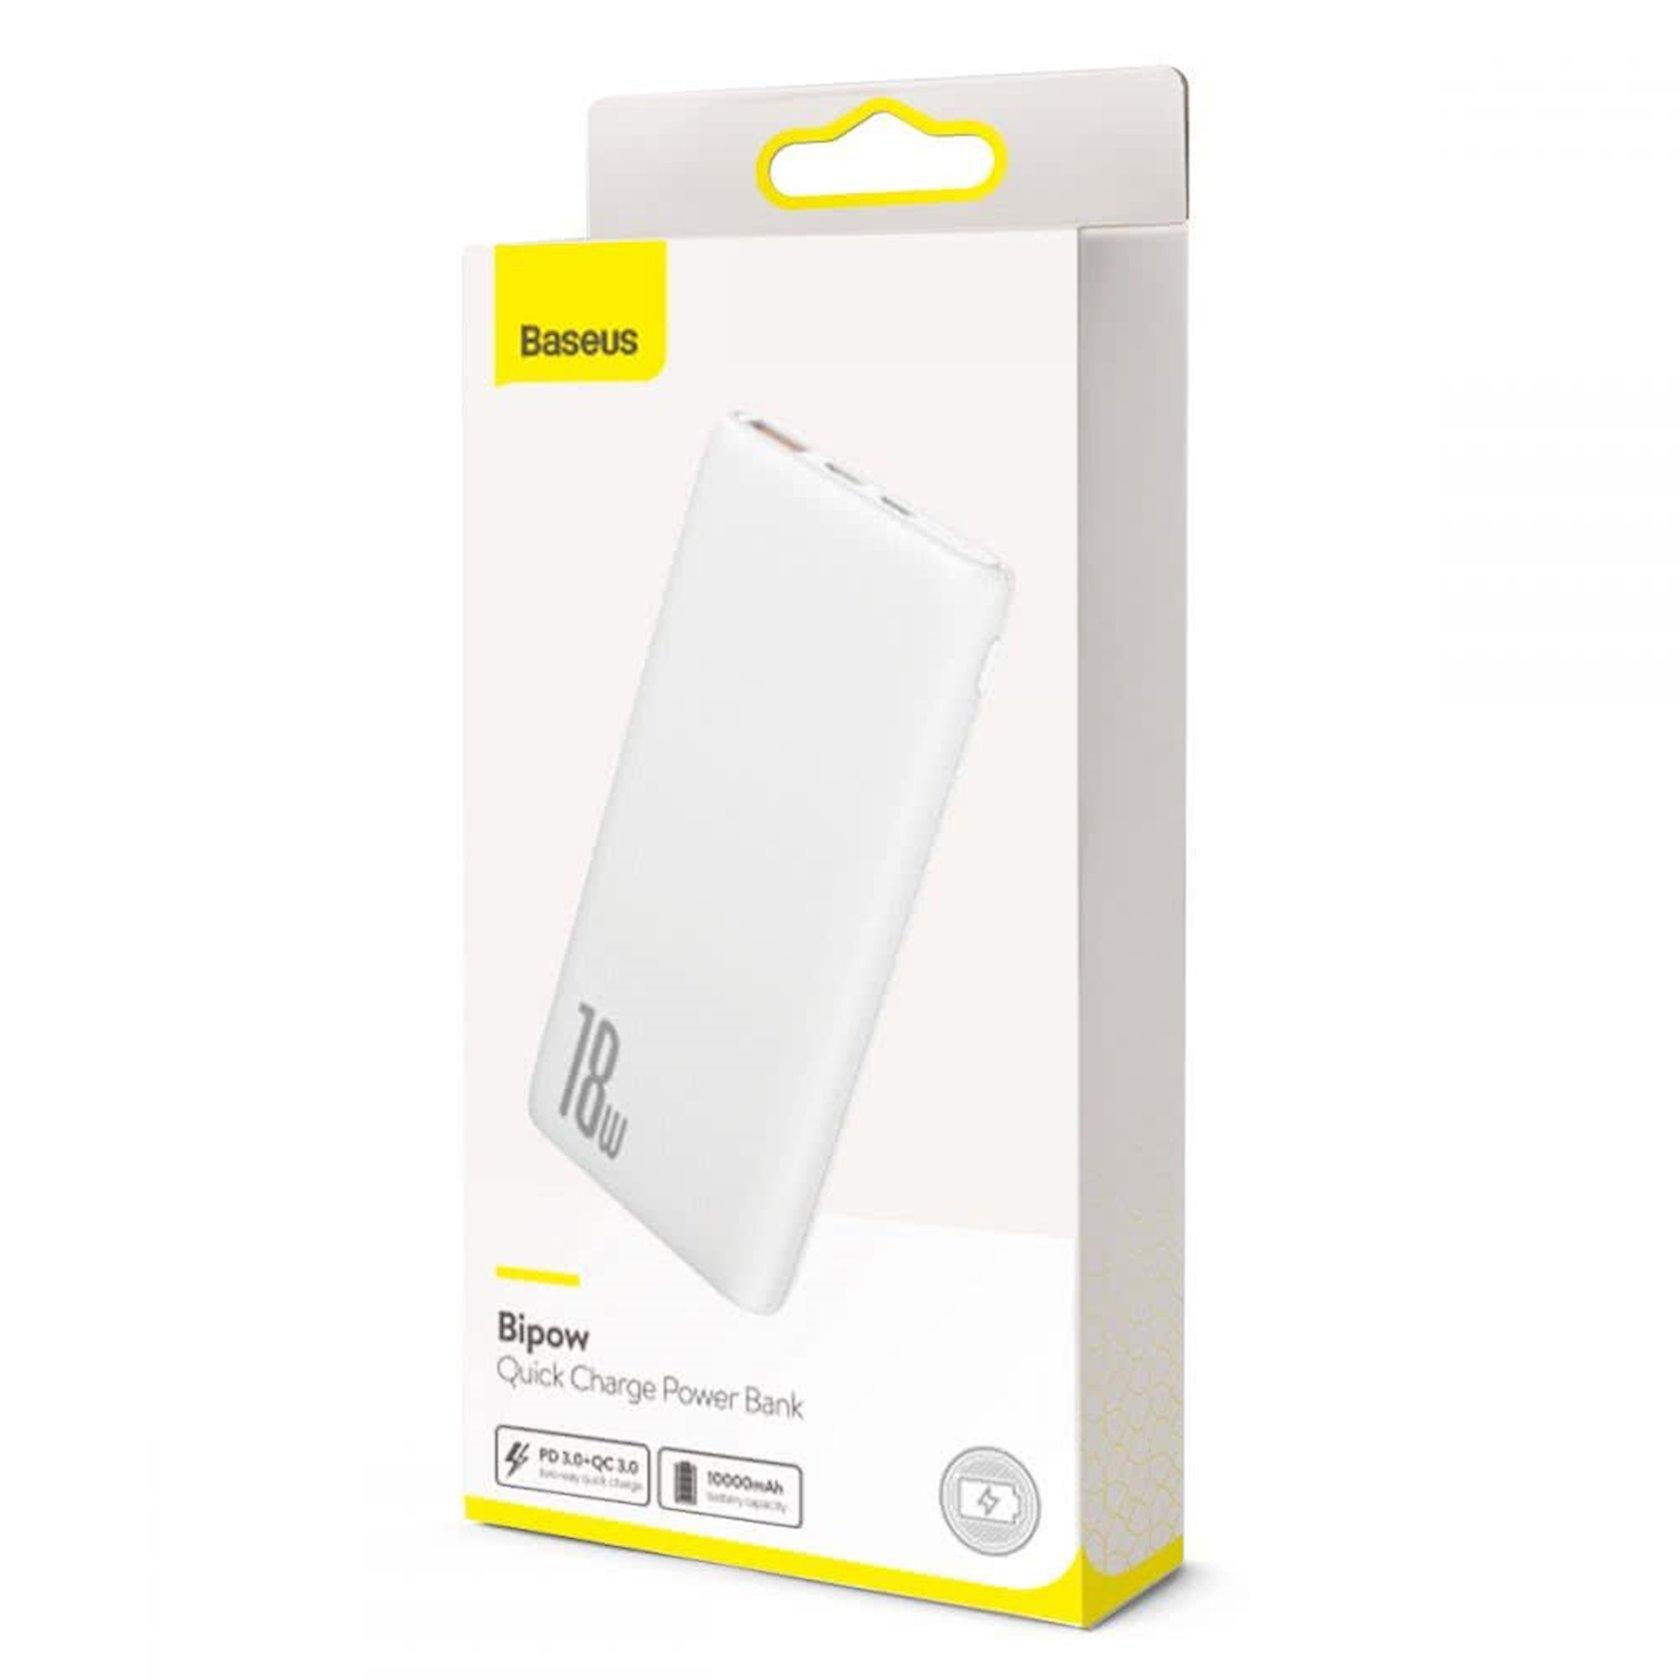 Powerbank Baseus Bipow Quick Charge Power Bank PD+QC 10000mAh White